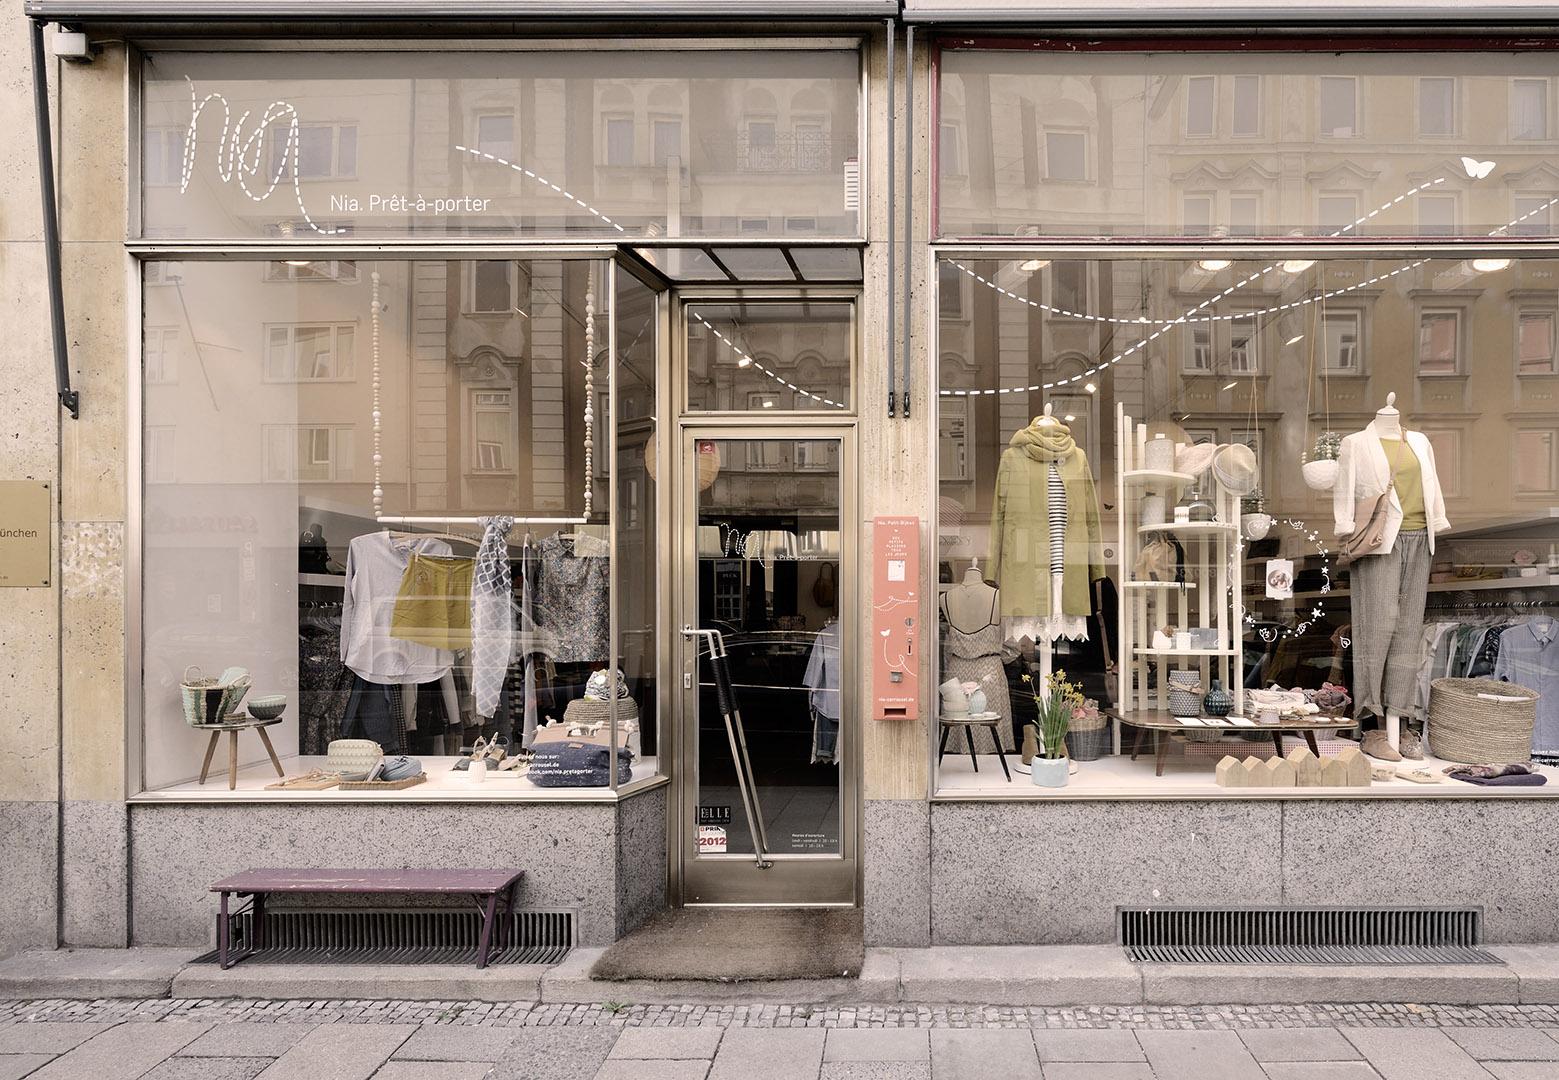 09_shops